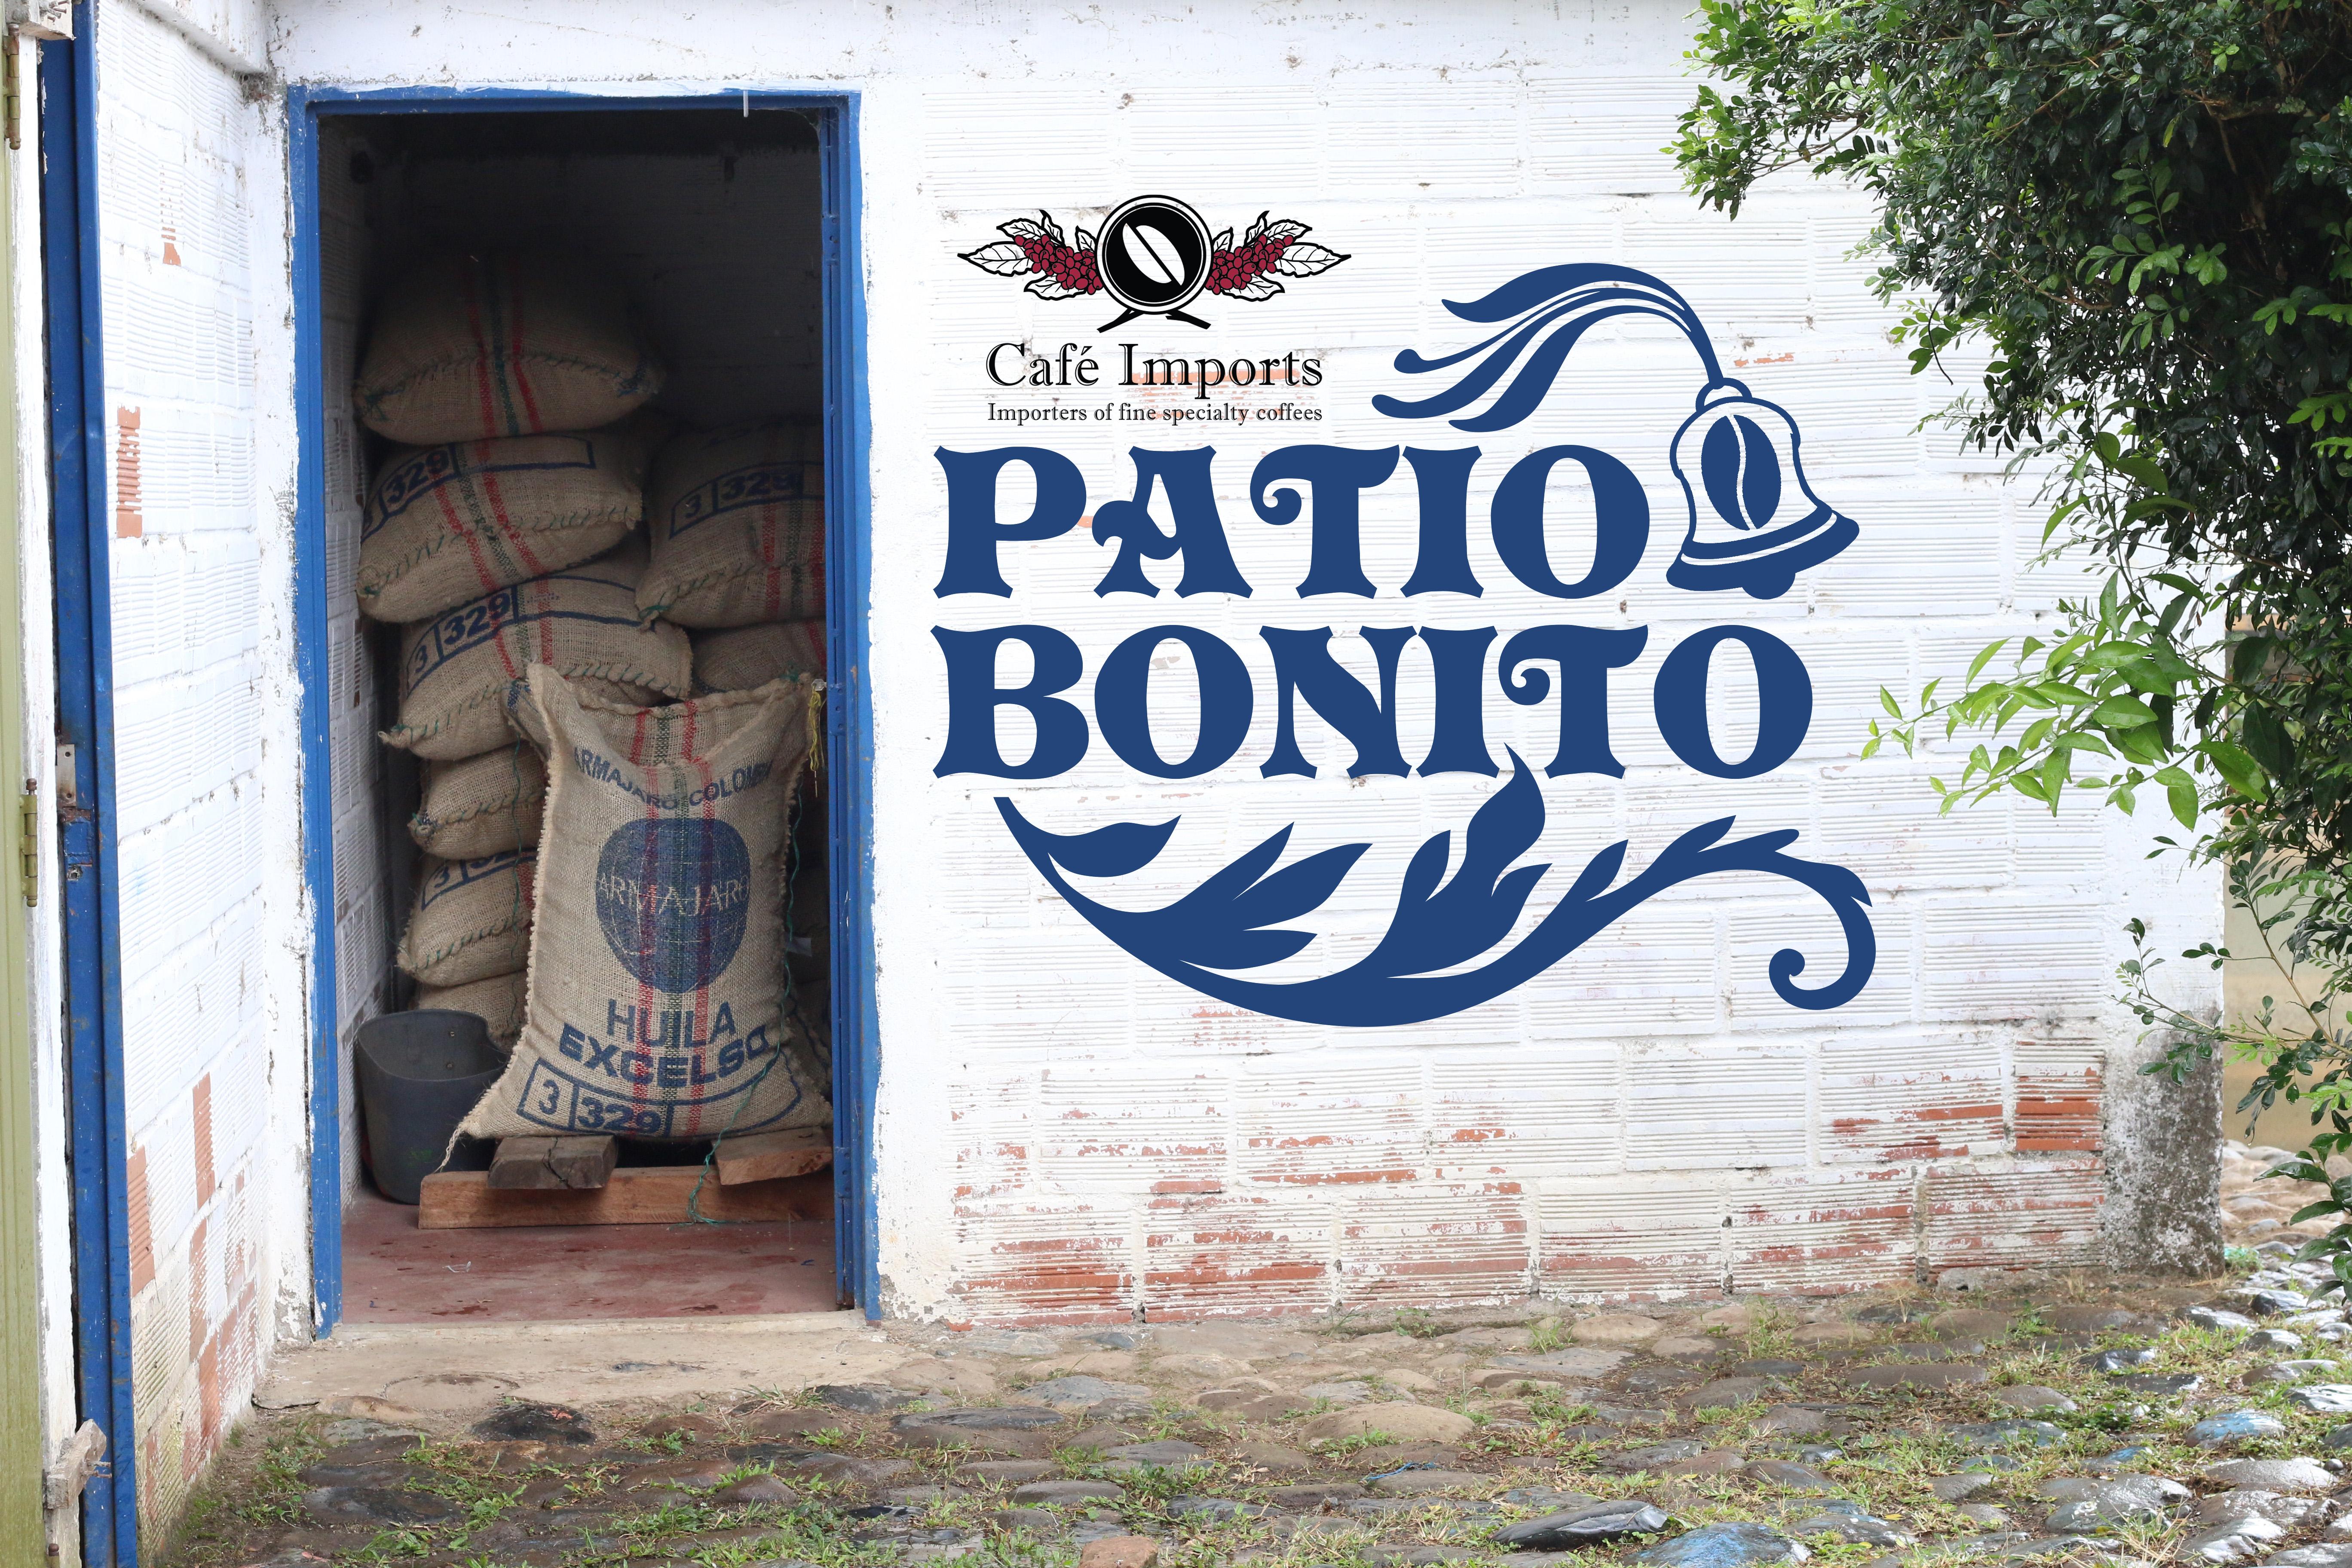 Cafe imports for Patio bonito